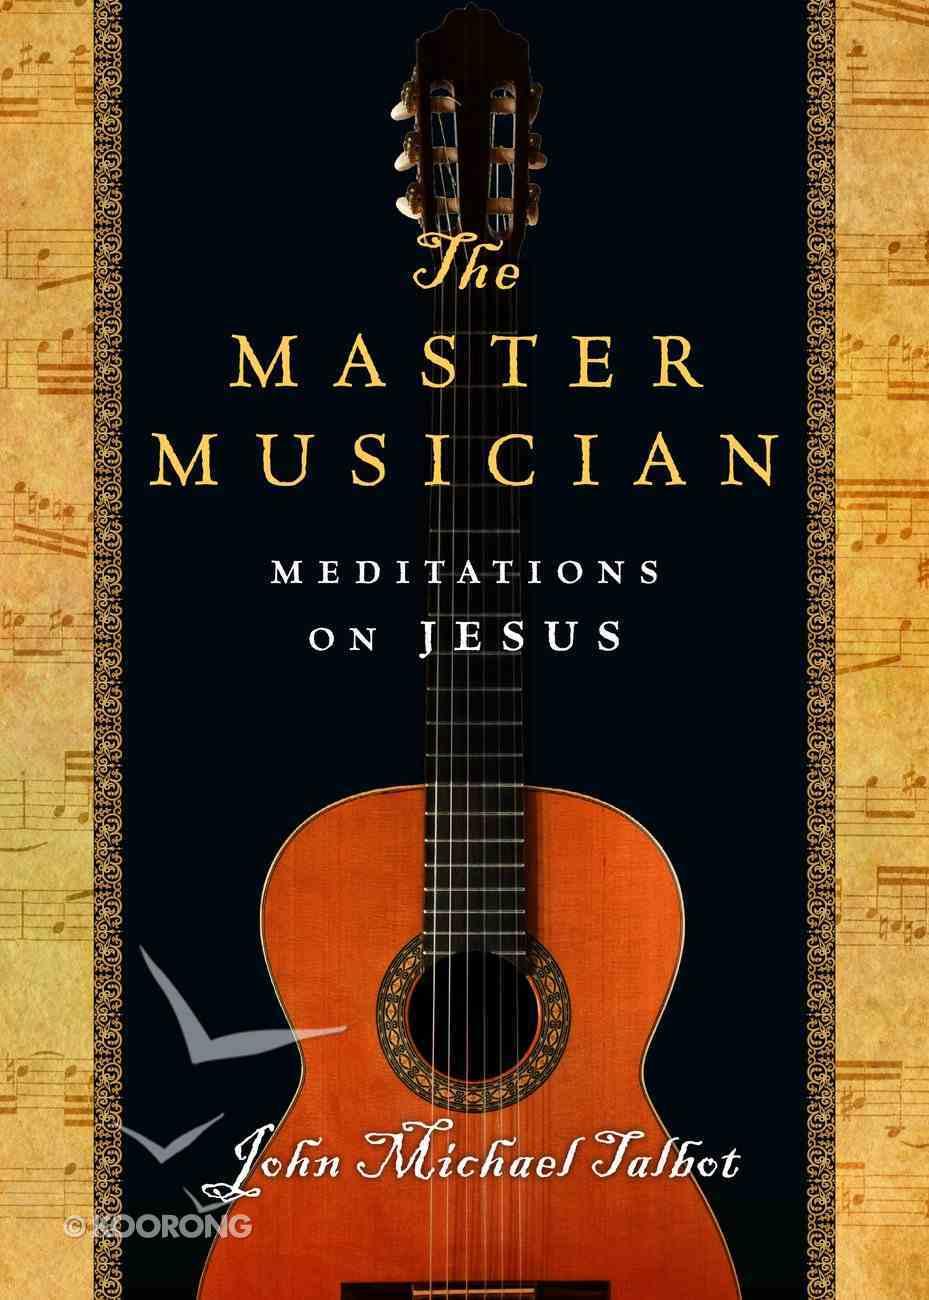 The Master Musician: Meditations on Jesus Paperback